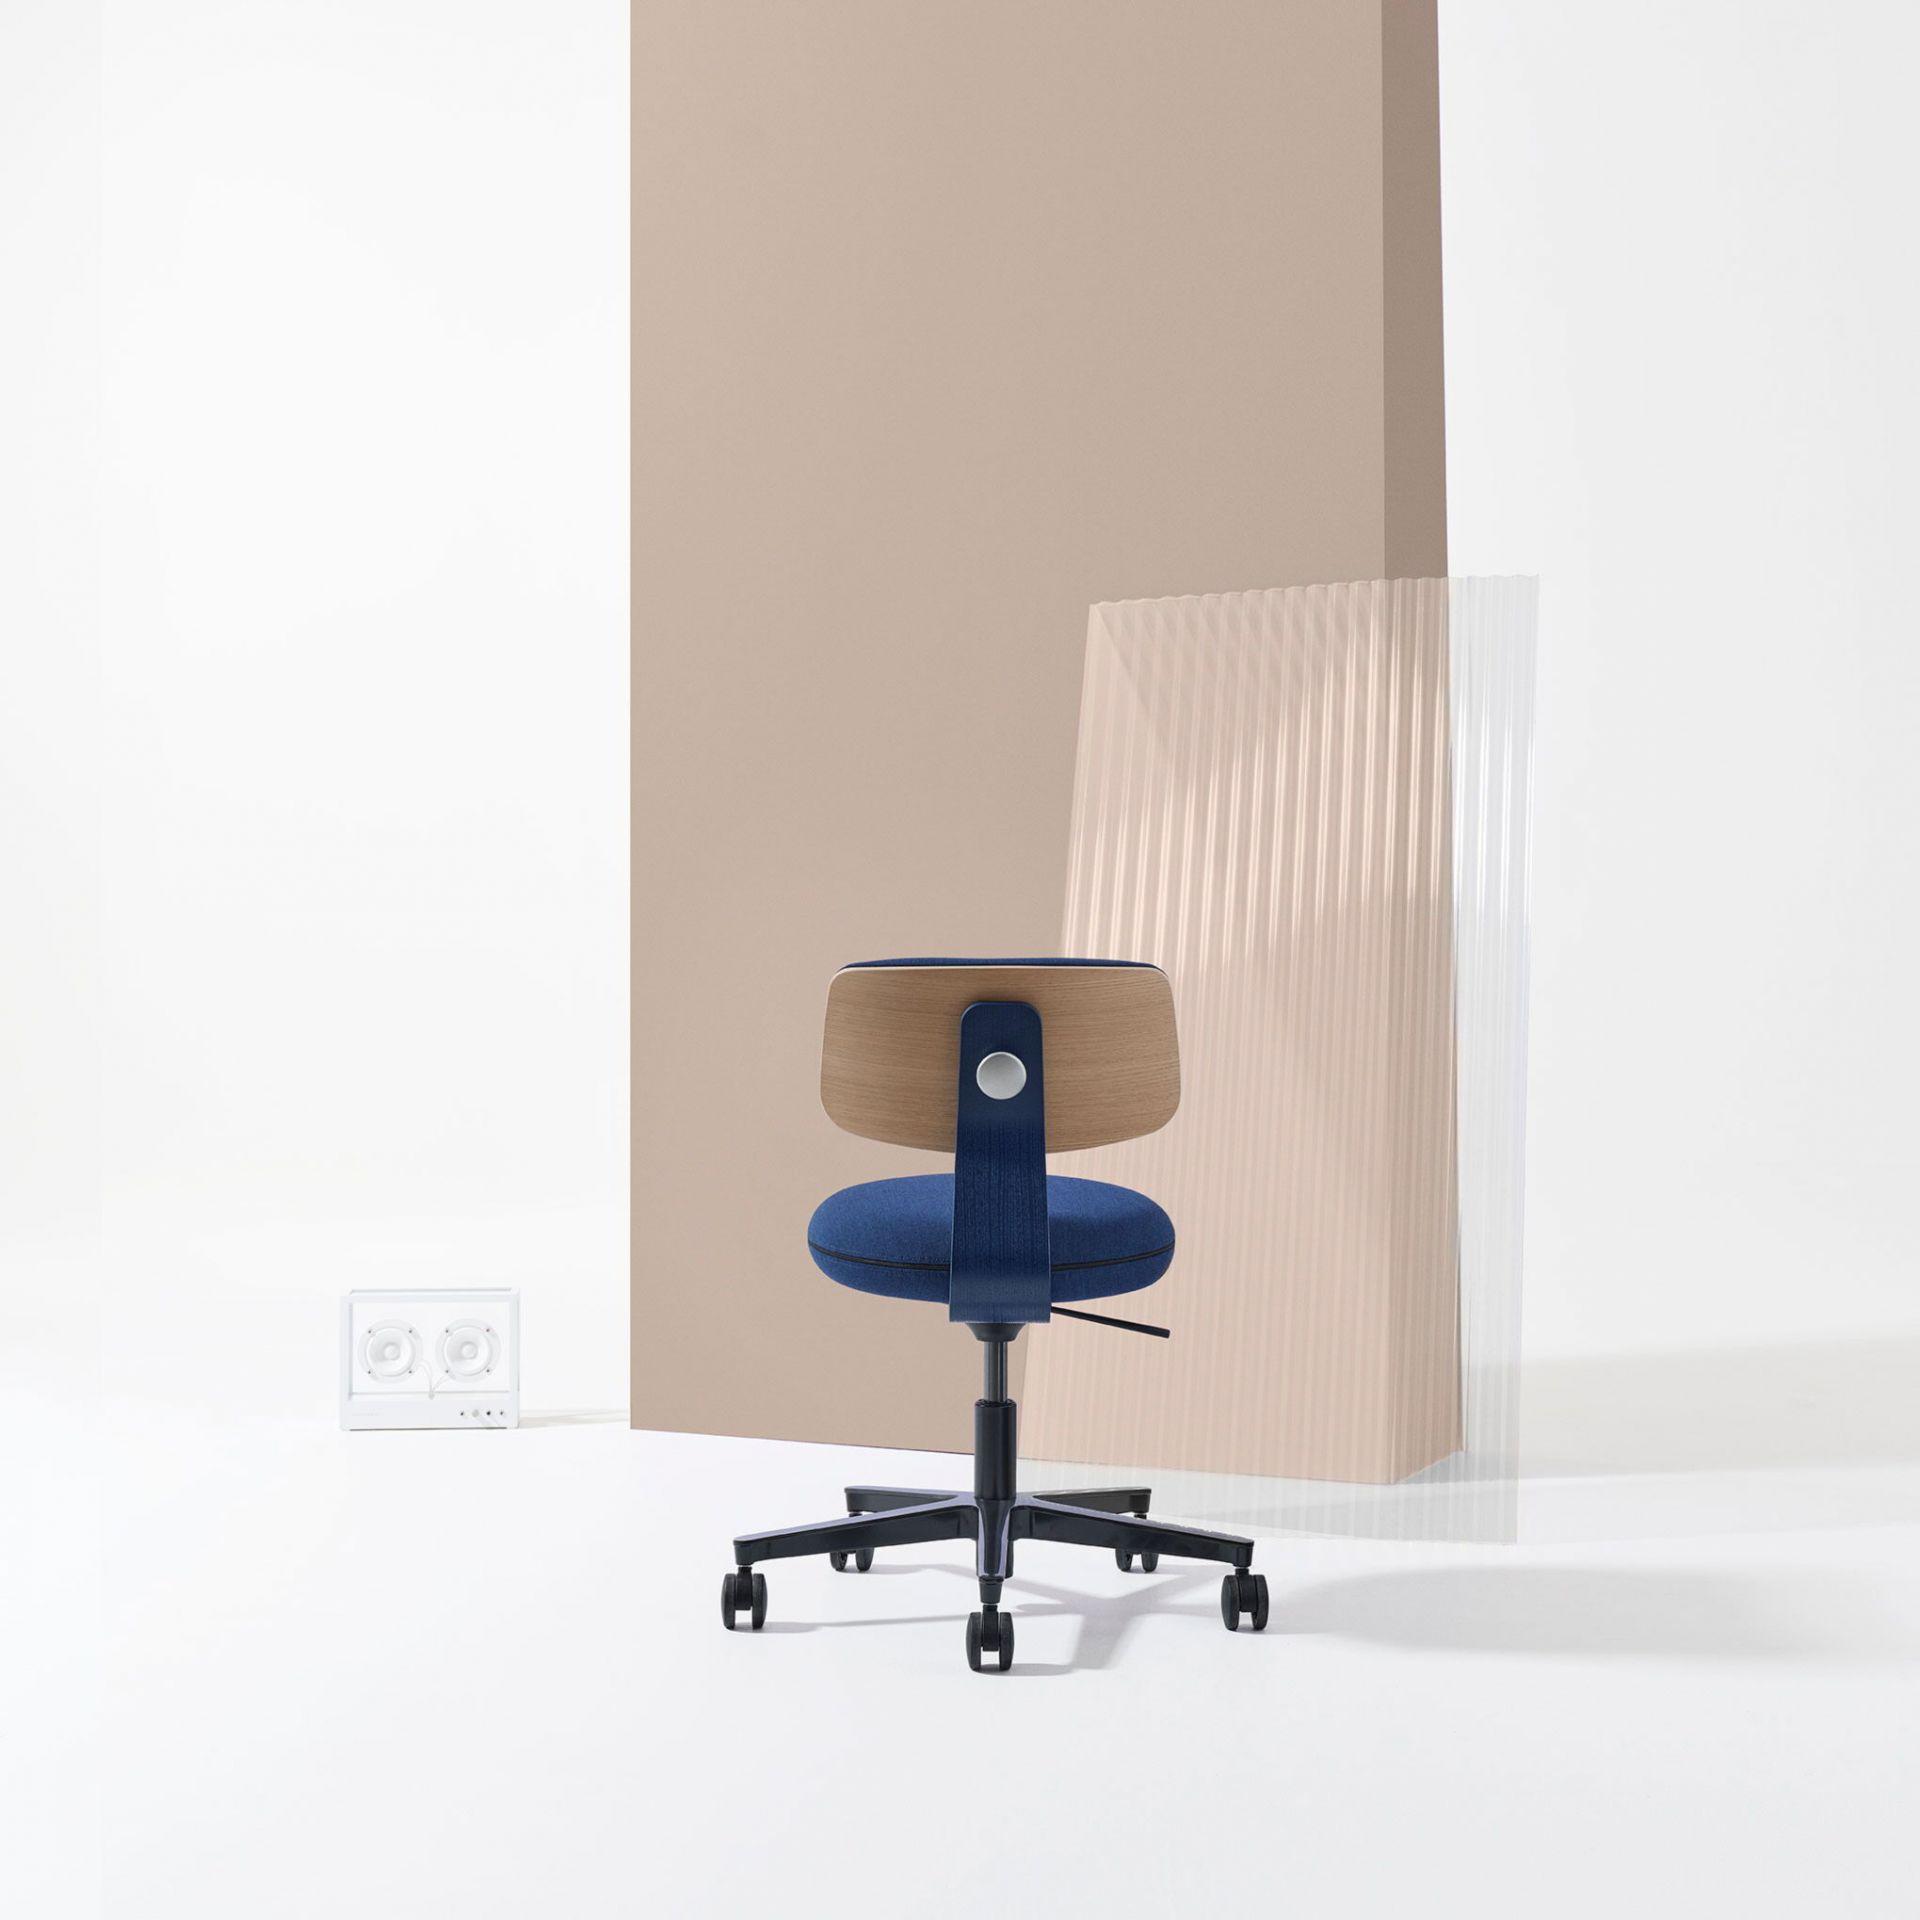 Savo 360 360 mötesstol produktbild 6